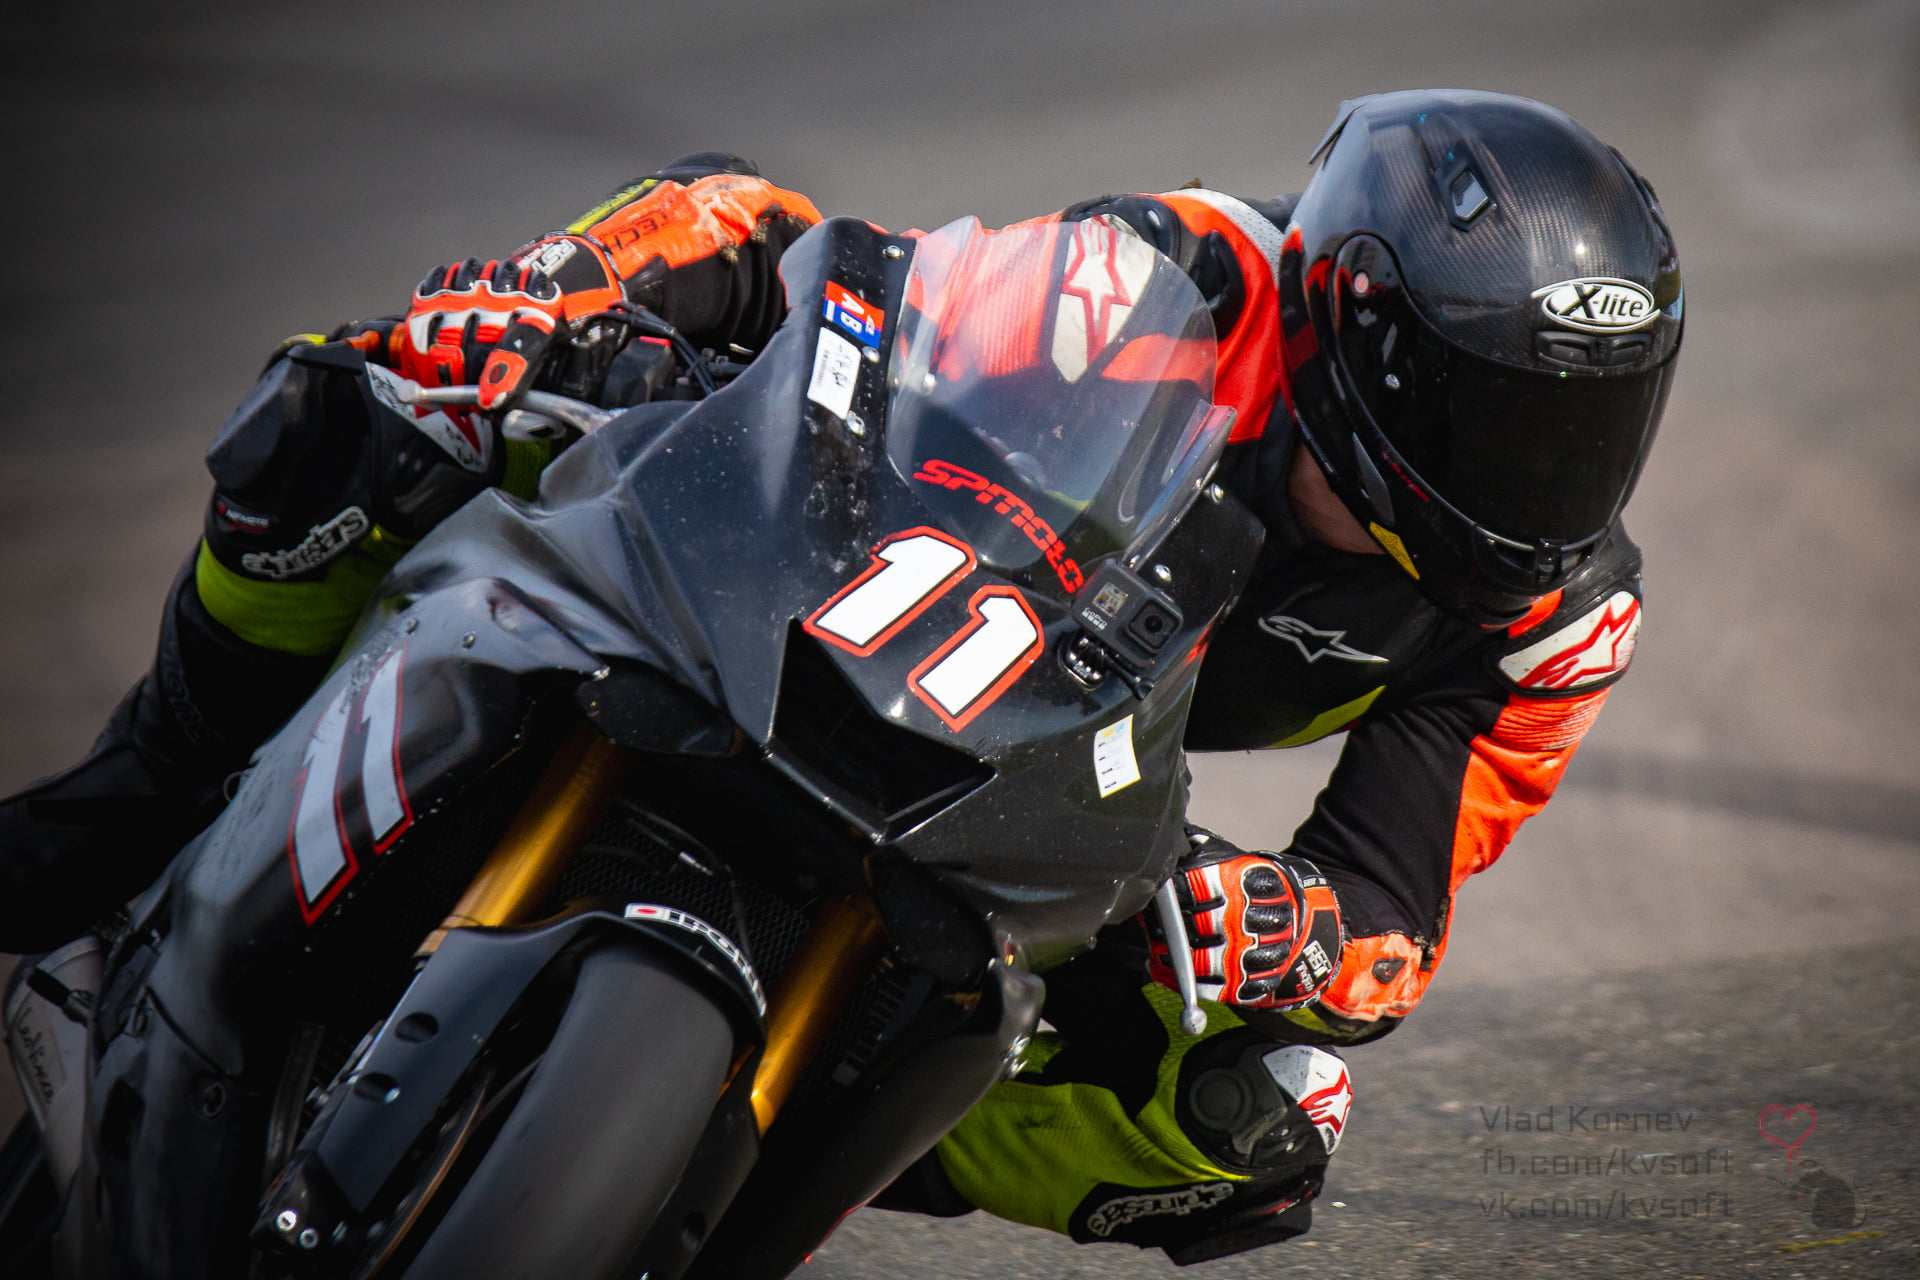 5-6_etap_MotoGPUkraine_141